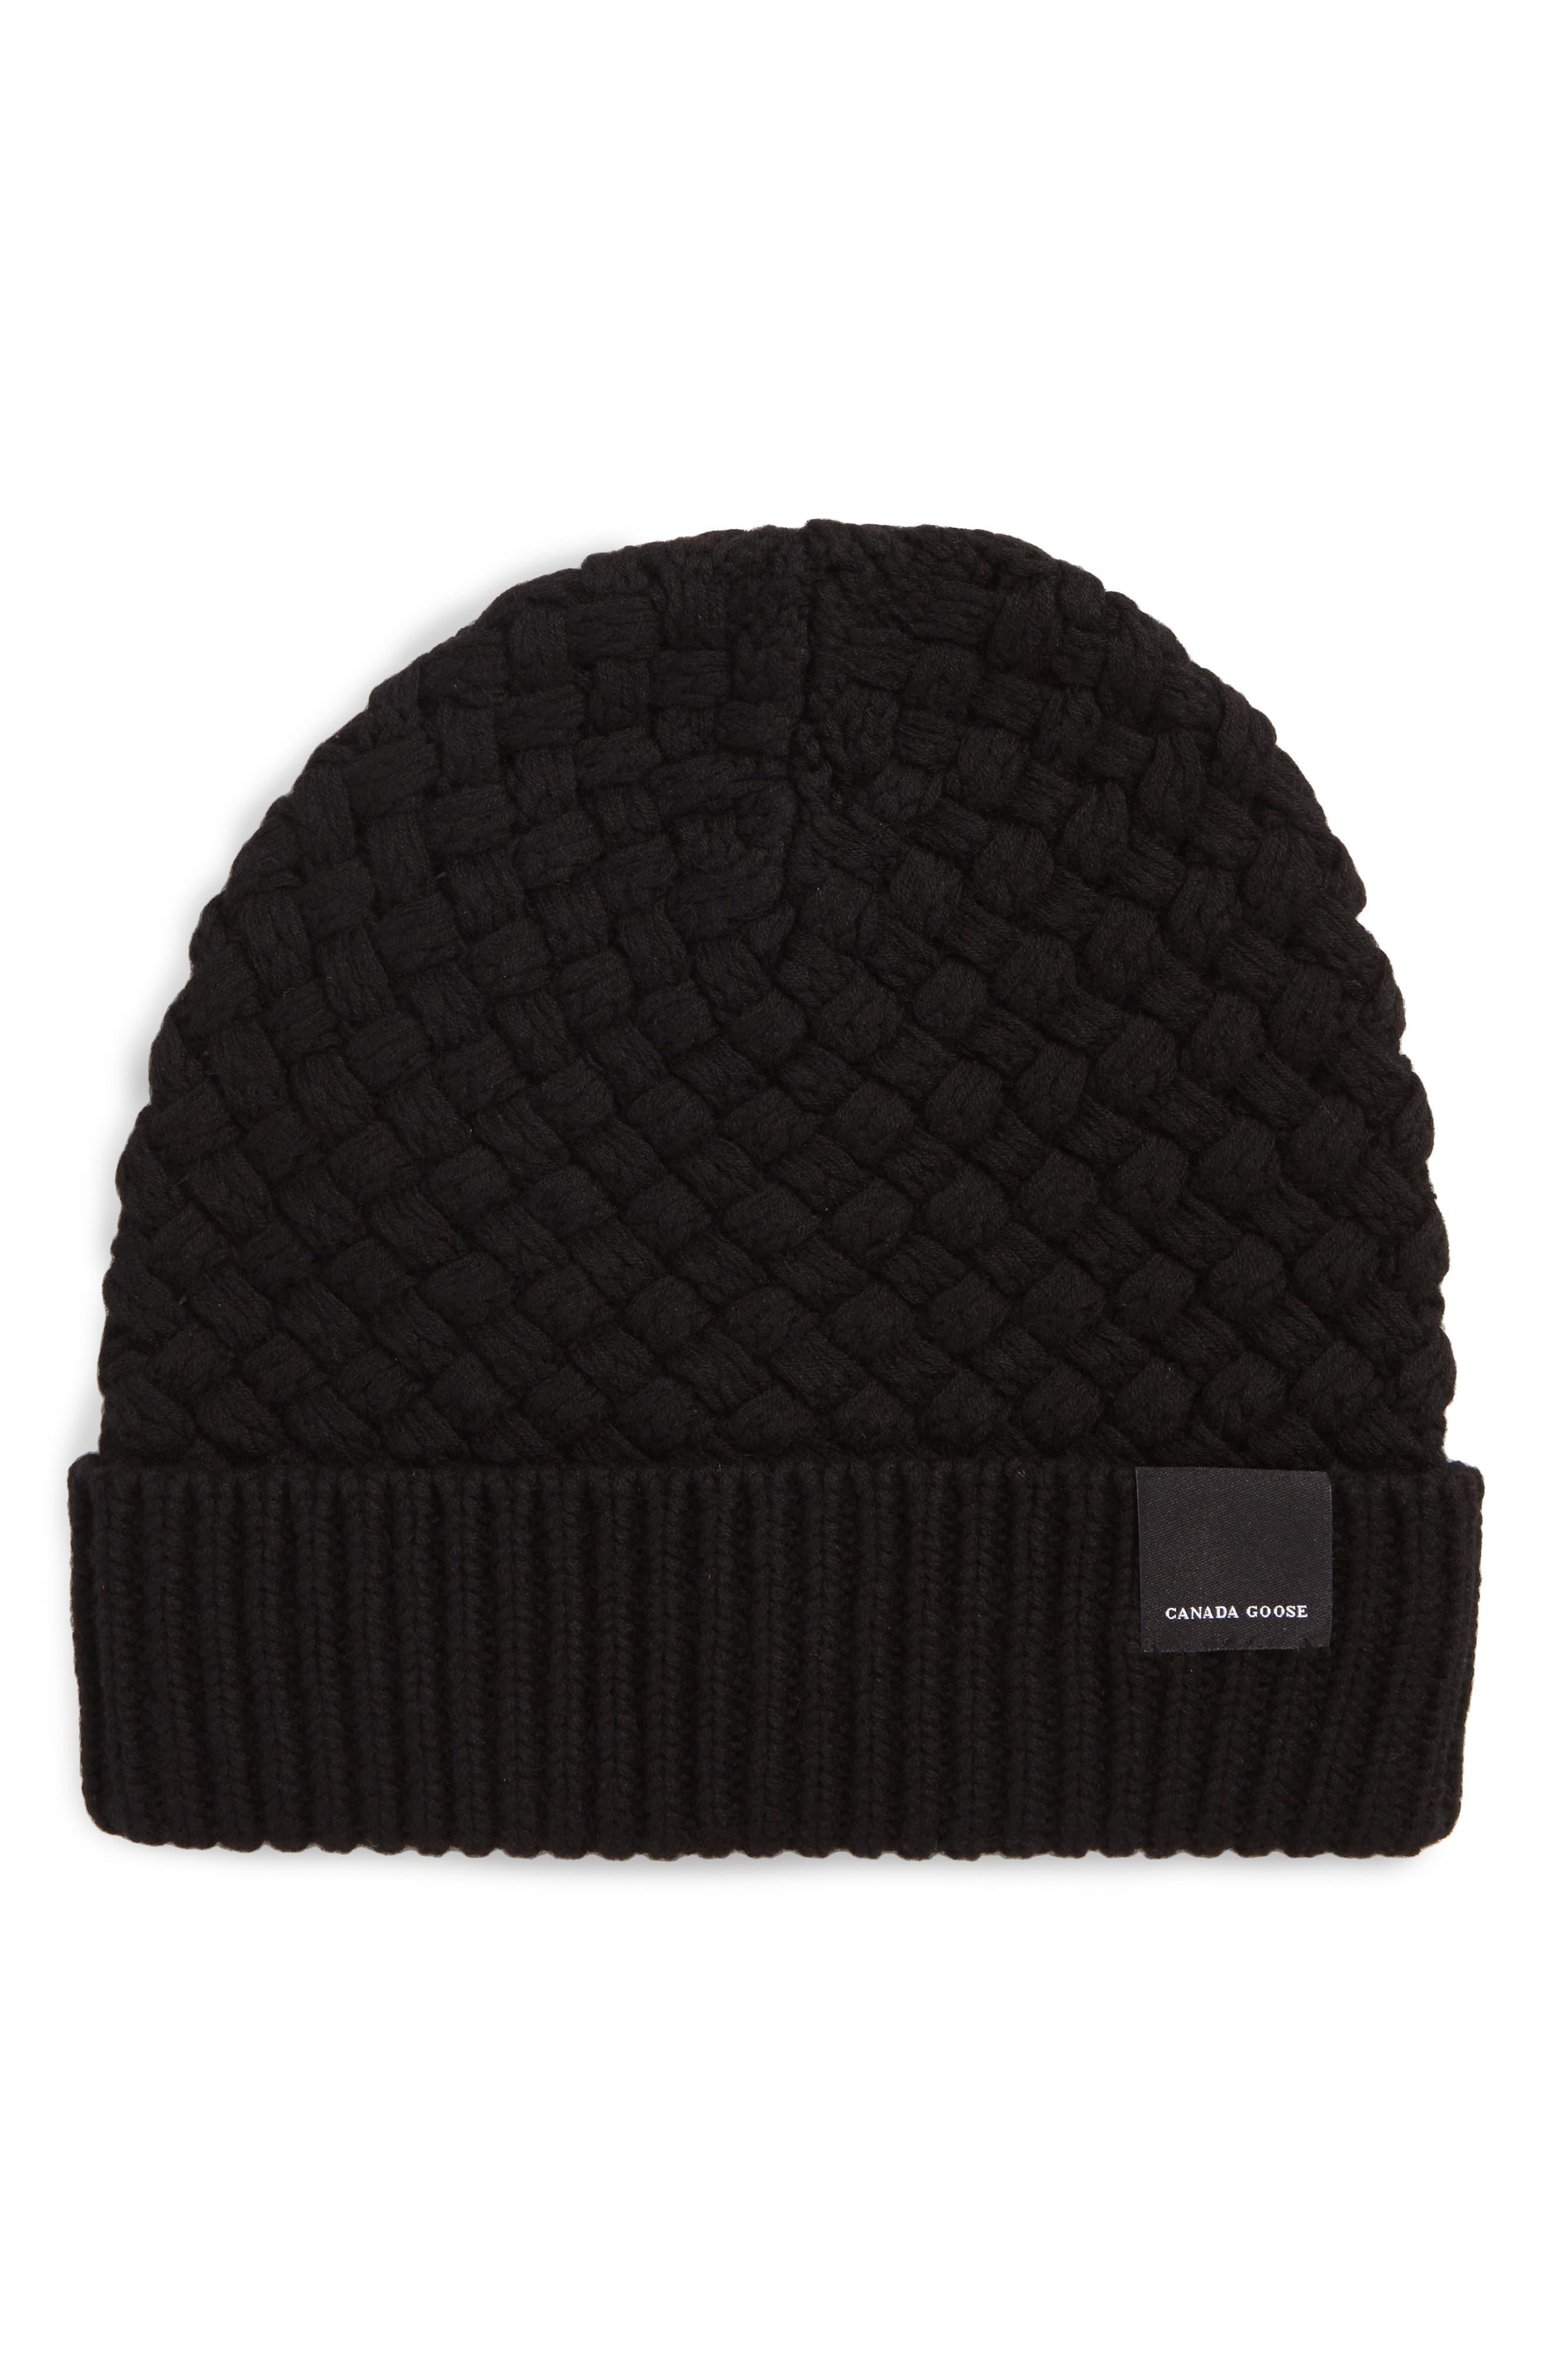 Merino Wool Basket Stitch Beanie,                         Main,                         color, Black